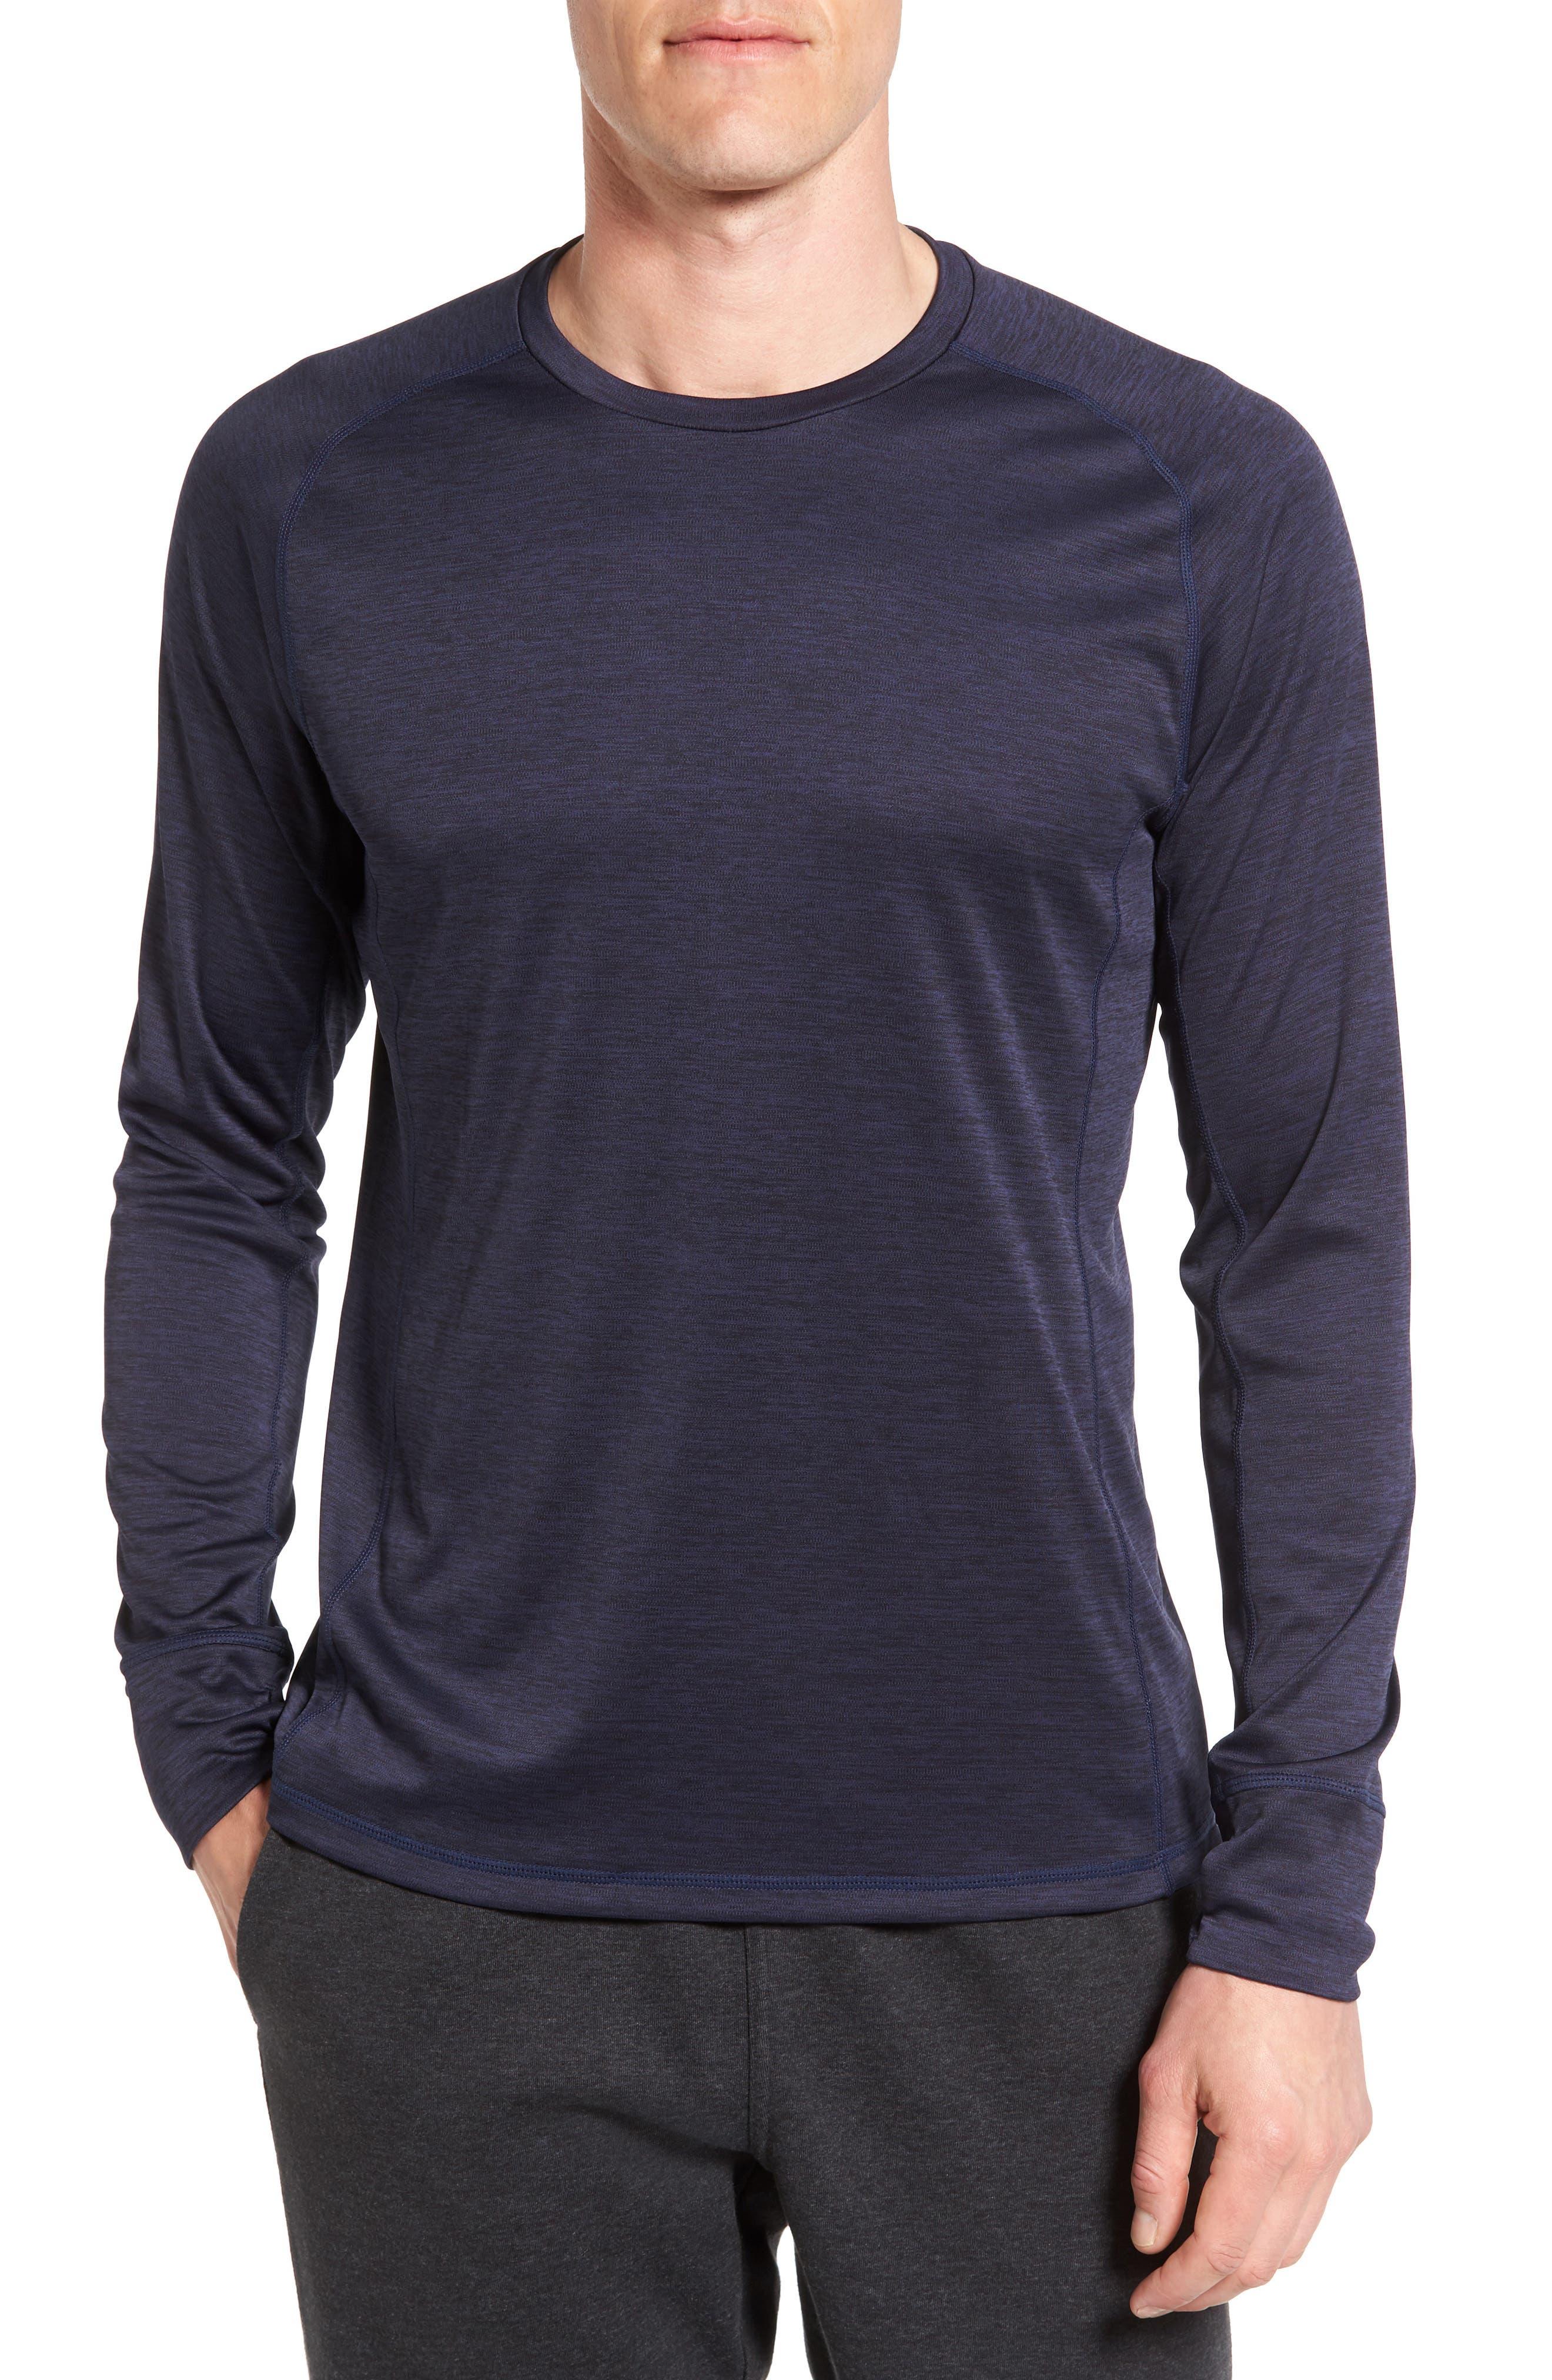 Alternate Image 1 Selected - Zella Triplite Long Sleeve T-Shirt